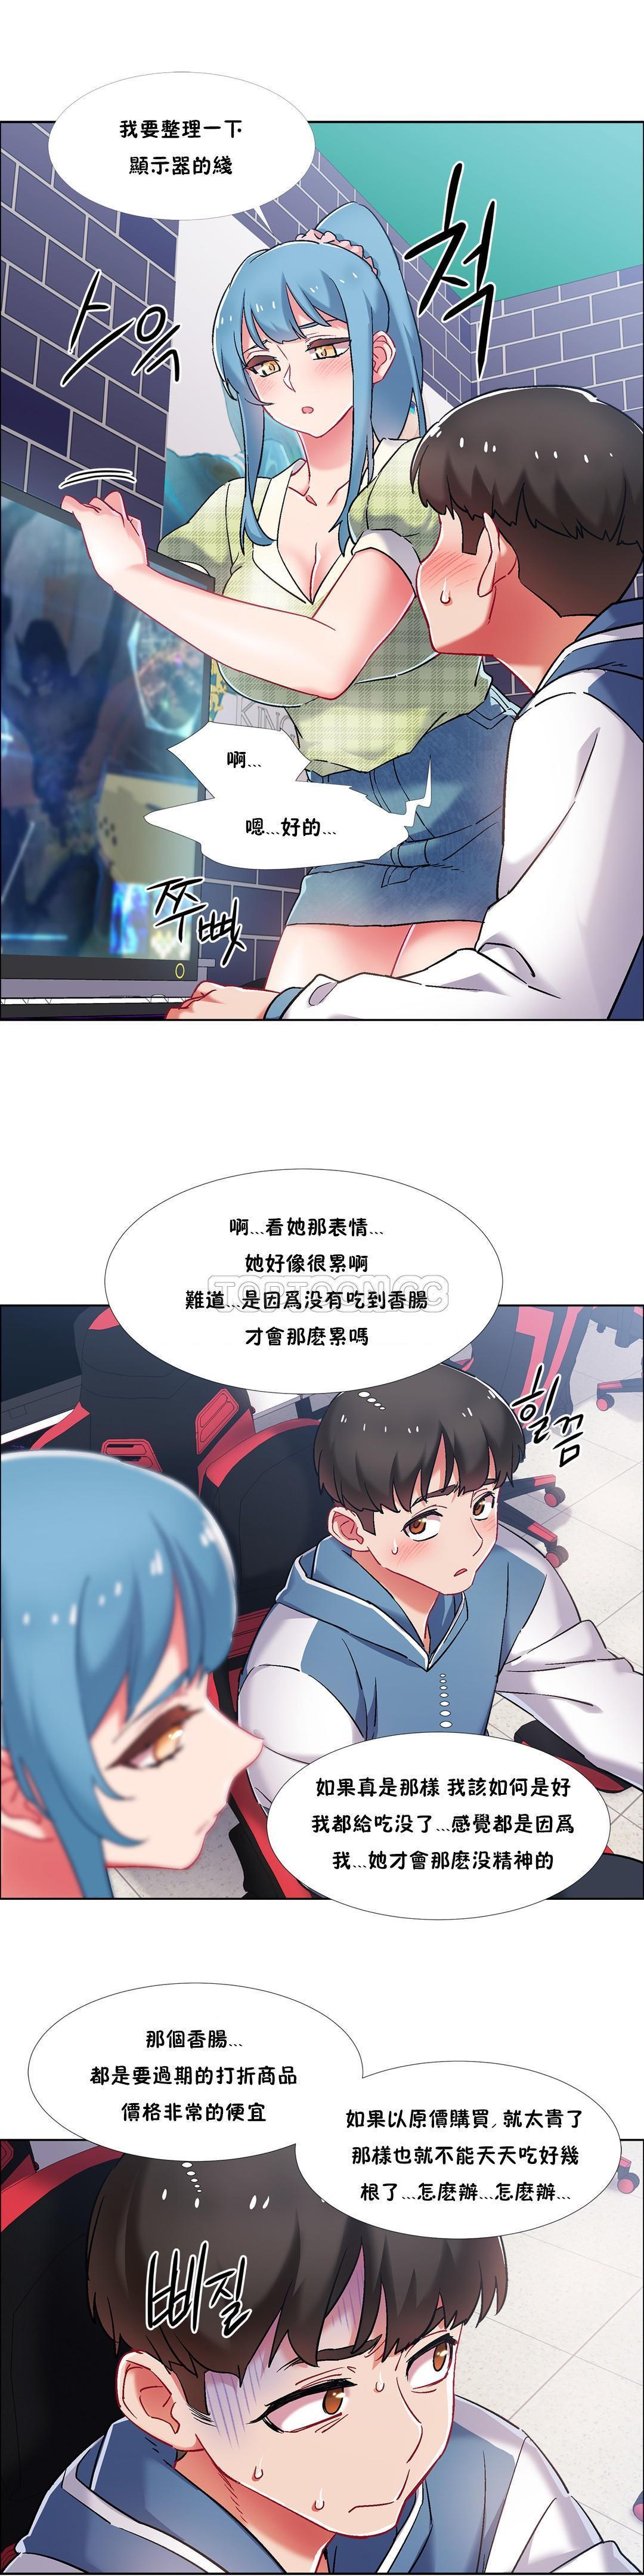 [Studio Wannabe] Rental Girls | 出租女郎 Ch. 33-58 [Chinese]  第二季 完结 84